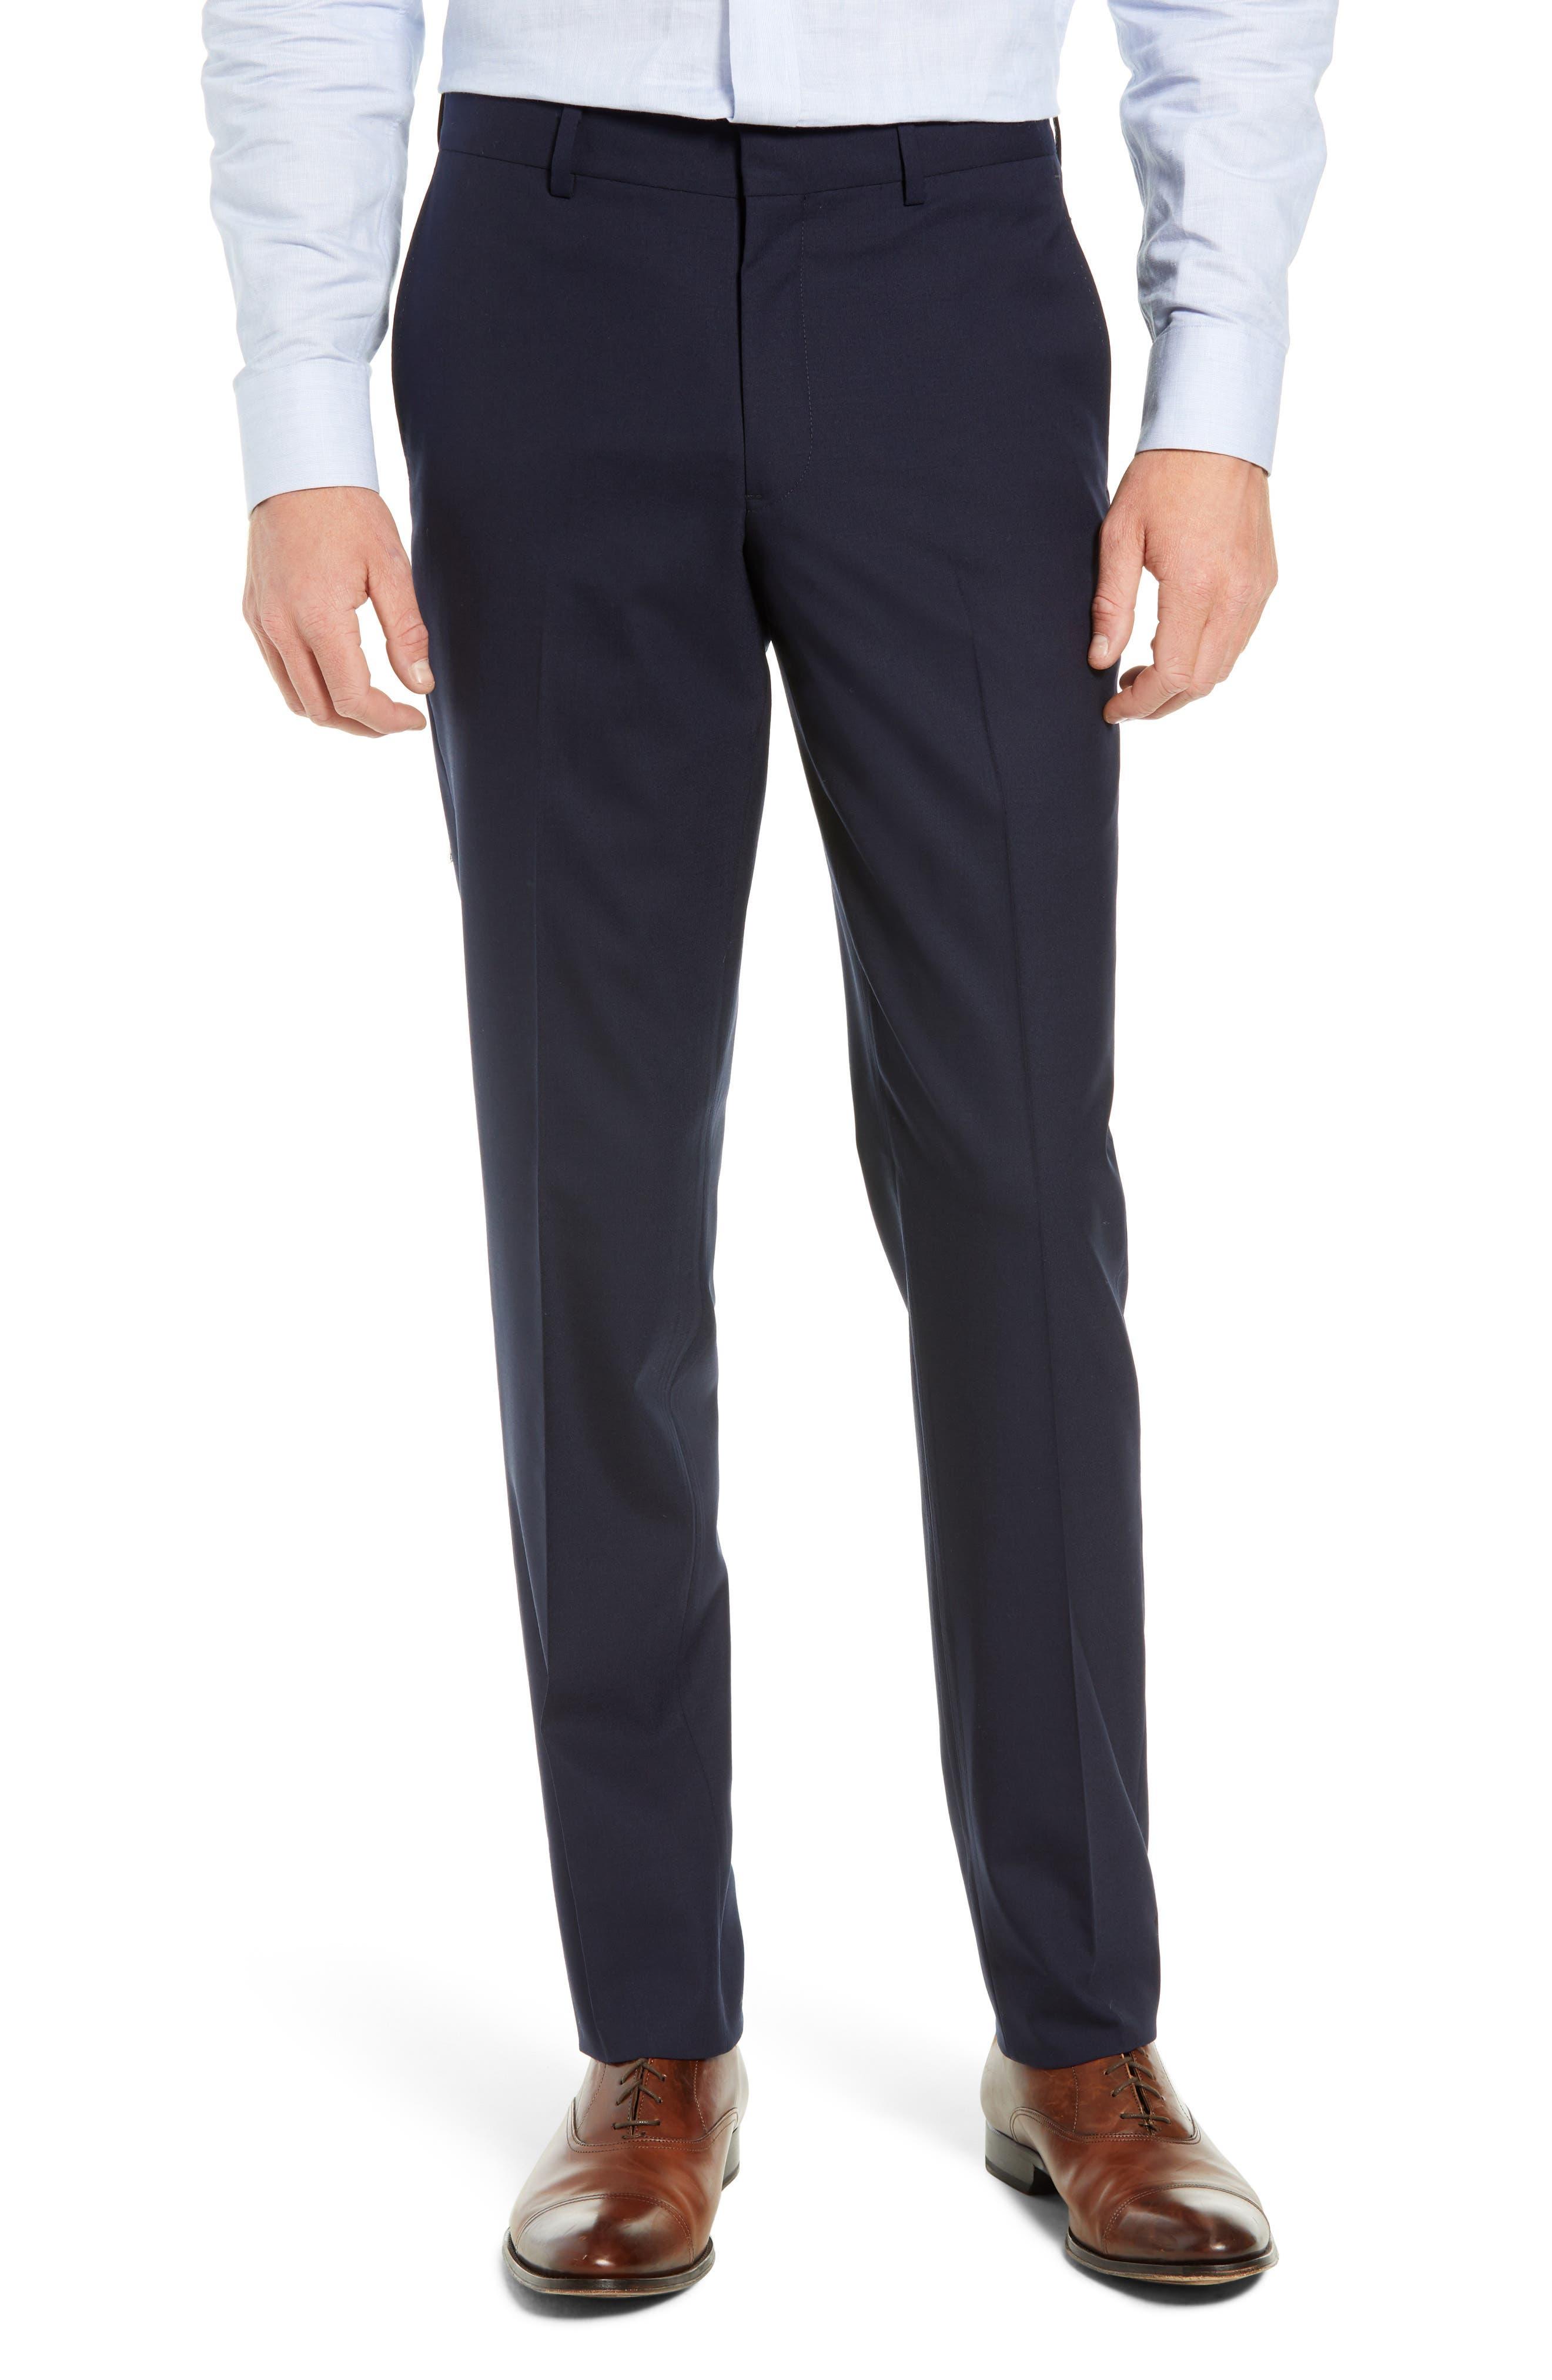 Mens Navy Dress Pants Size 44s High Quality Men's Clothing